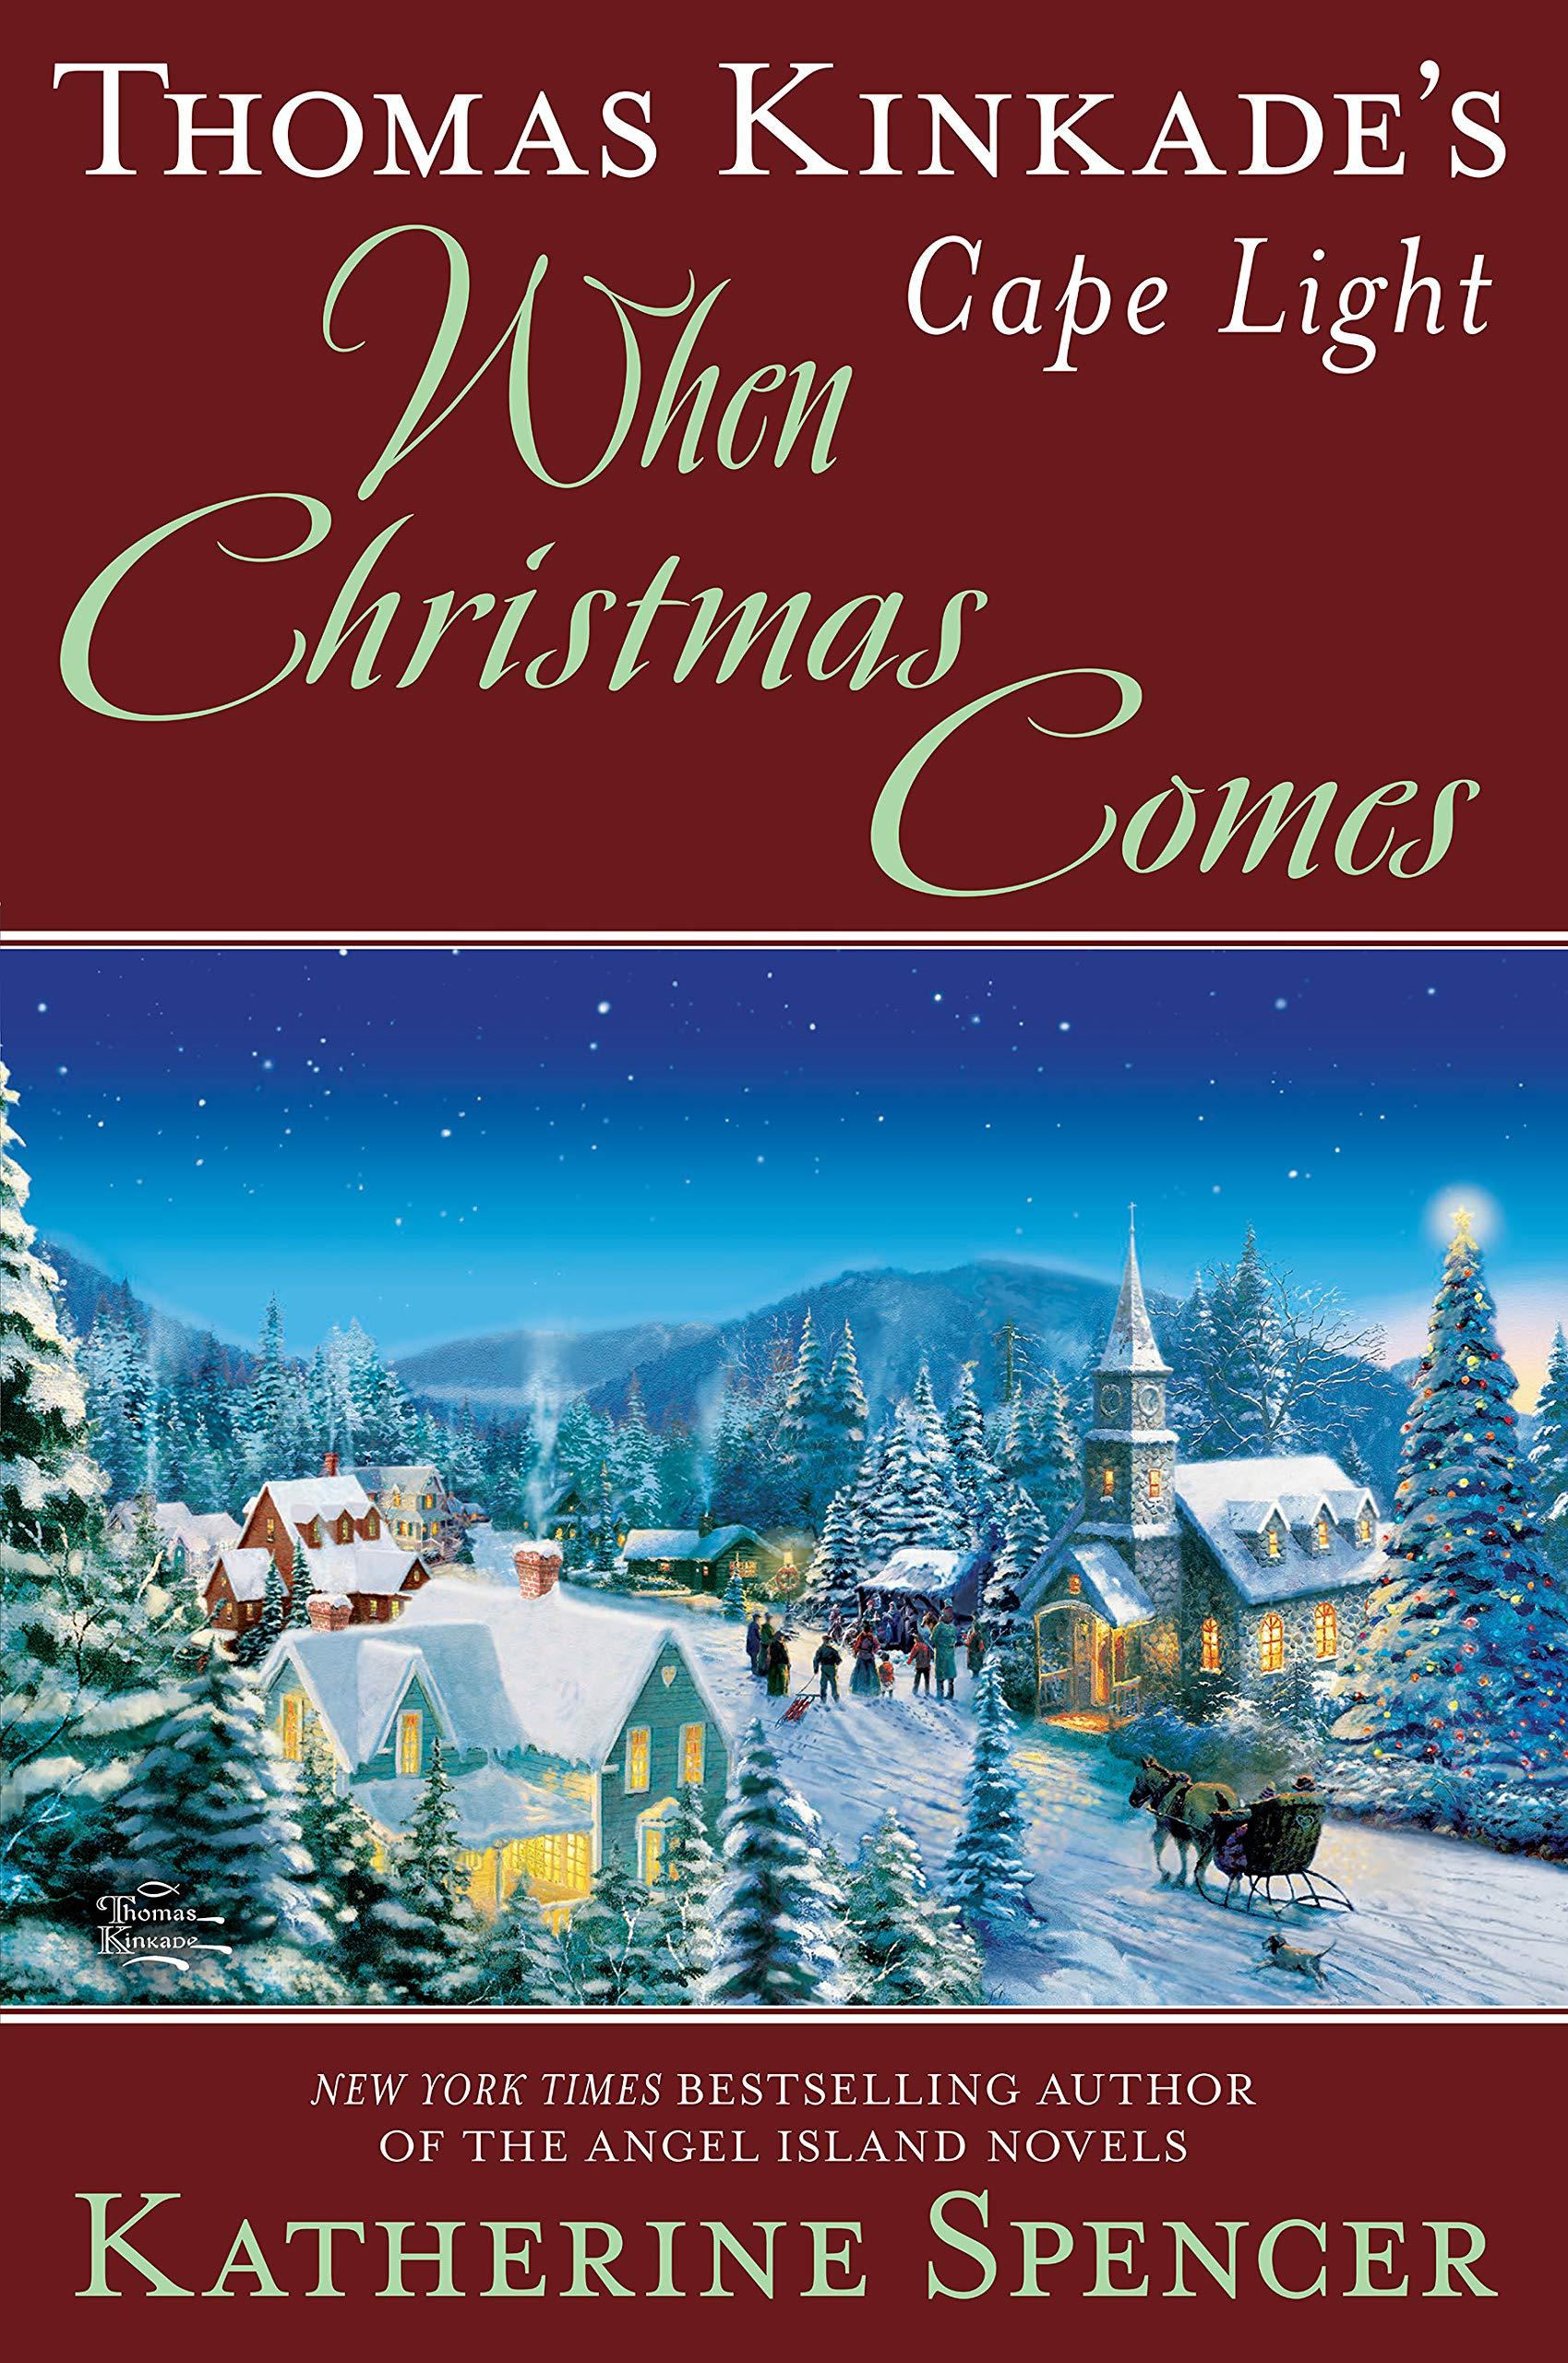 Thomas Kinkade's Cape Light: When Christmas Comes